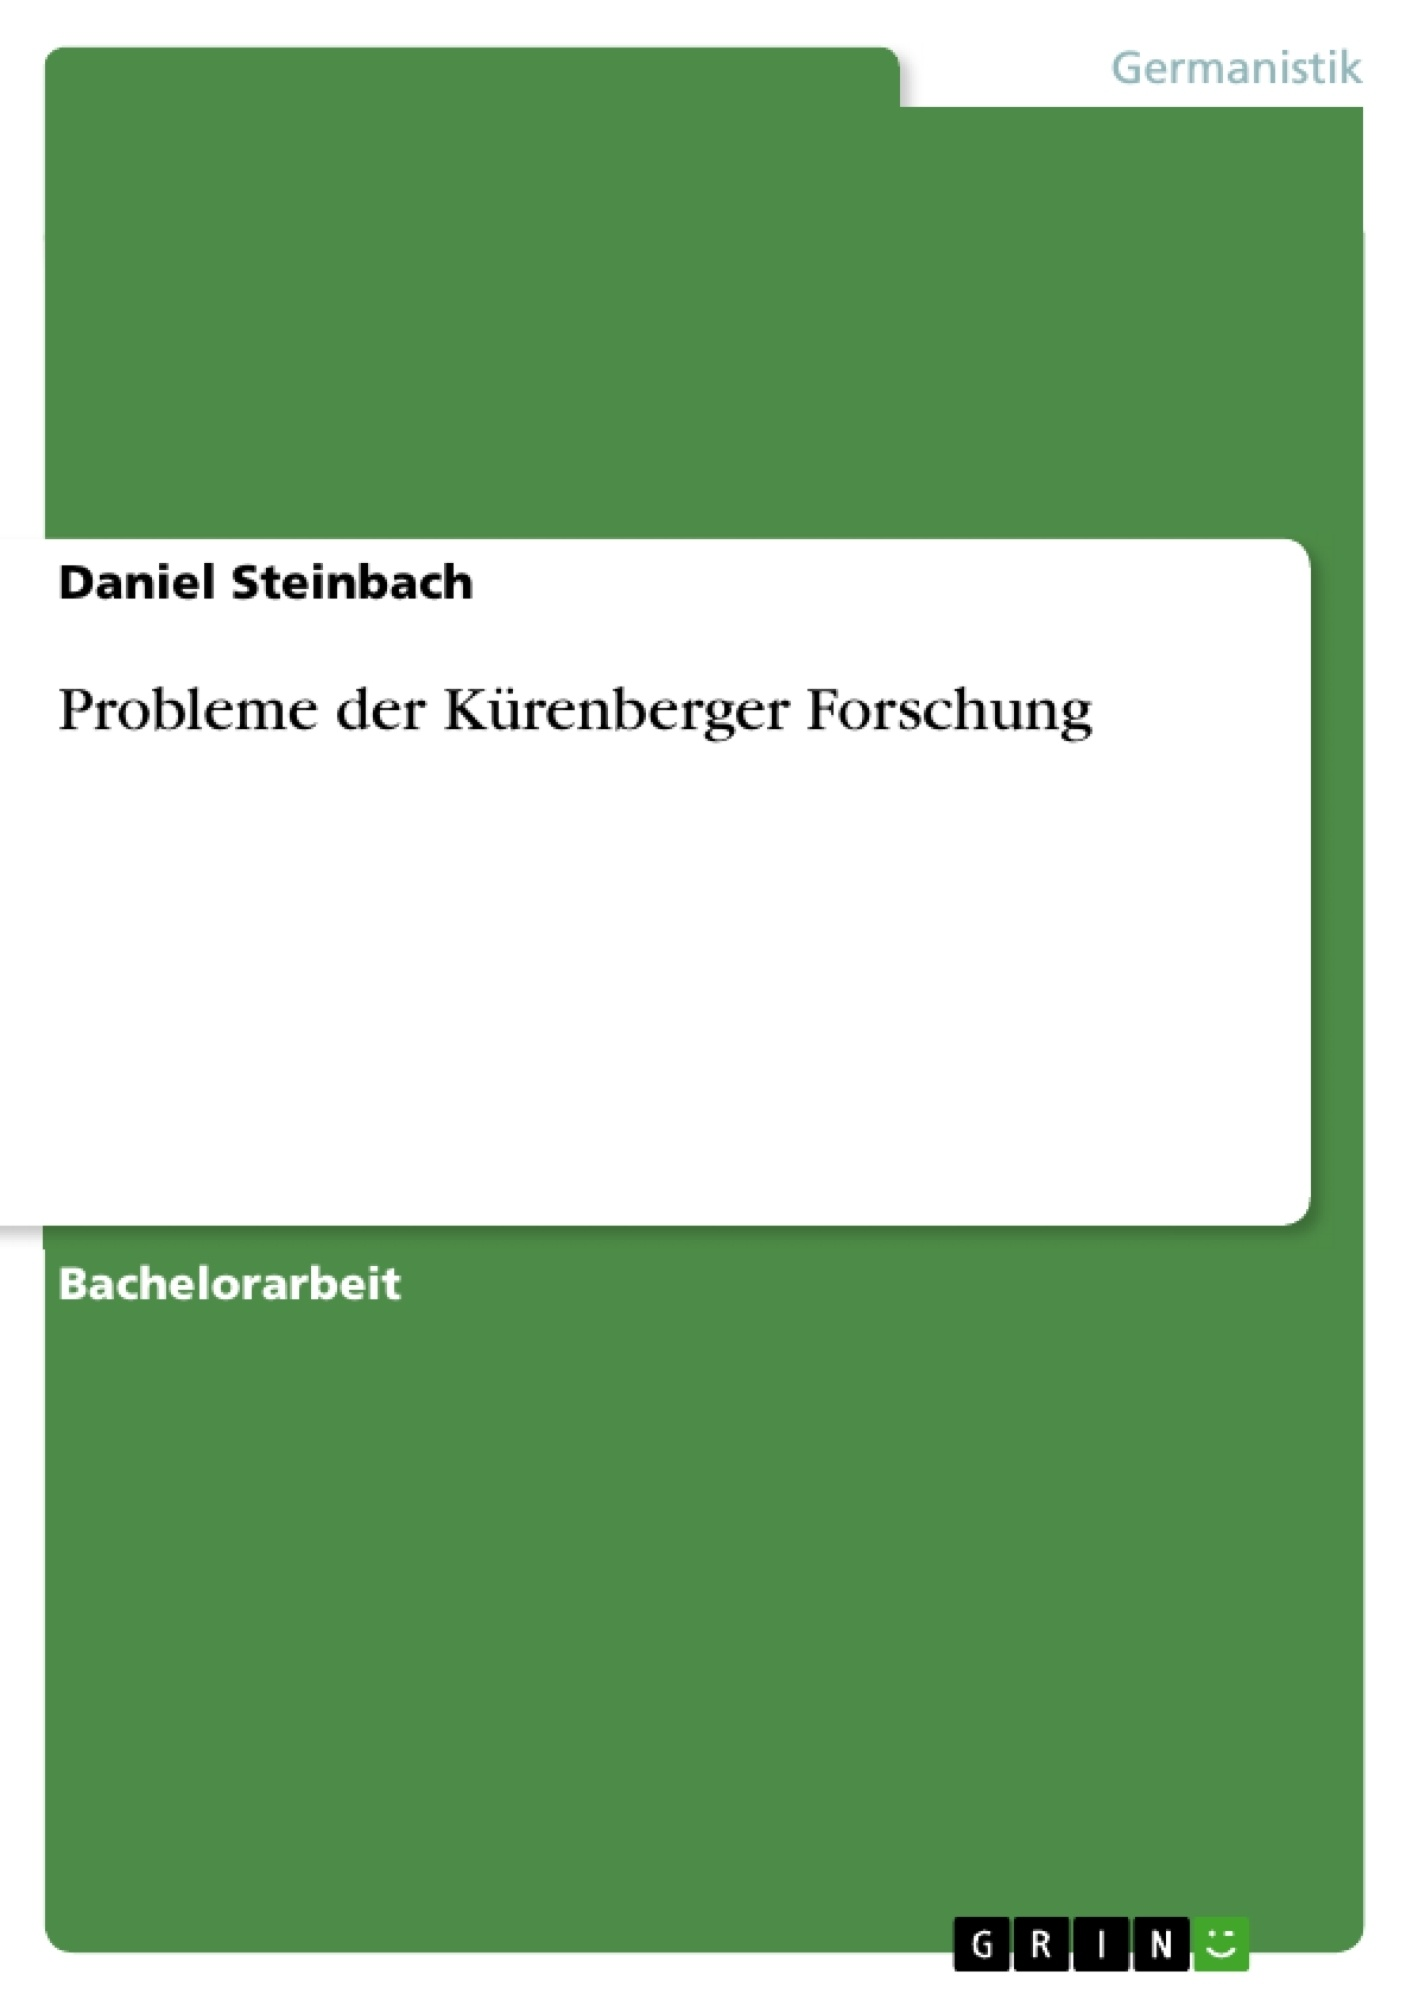 Titel: Probleme der Kürenberger Forschung